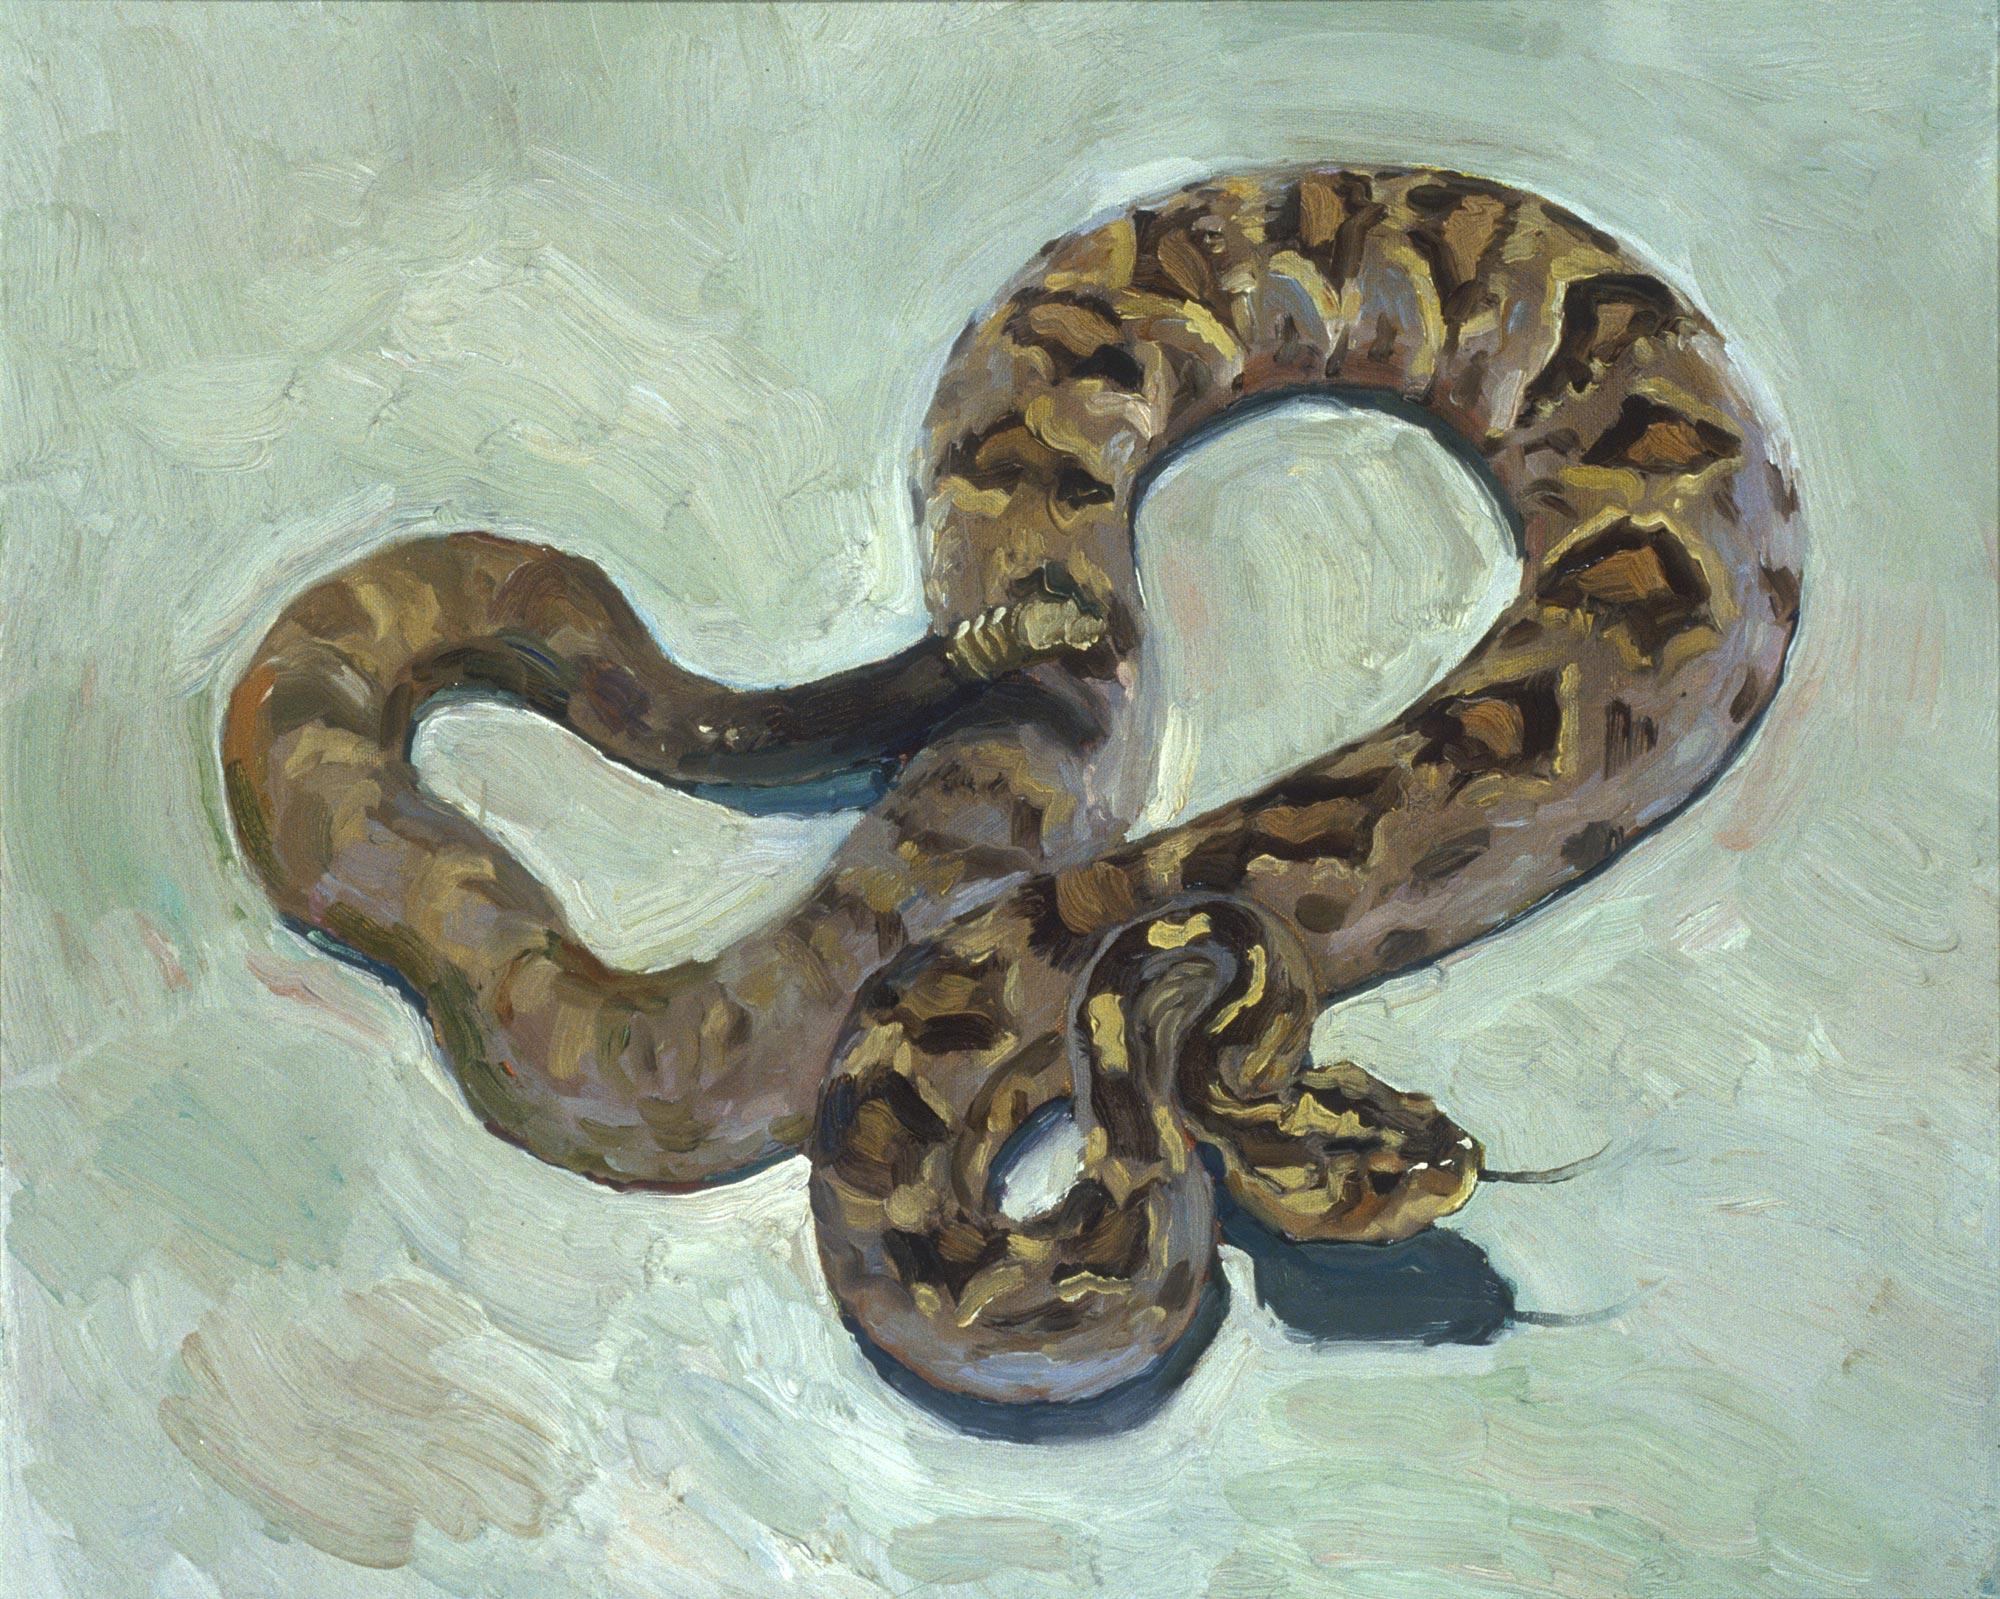 Rattlesnake 3, 20 x 24, oil on canvas, 2002